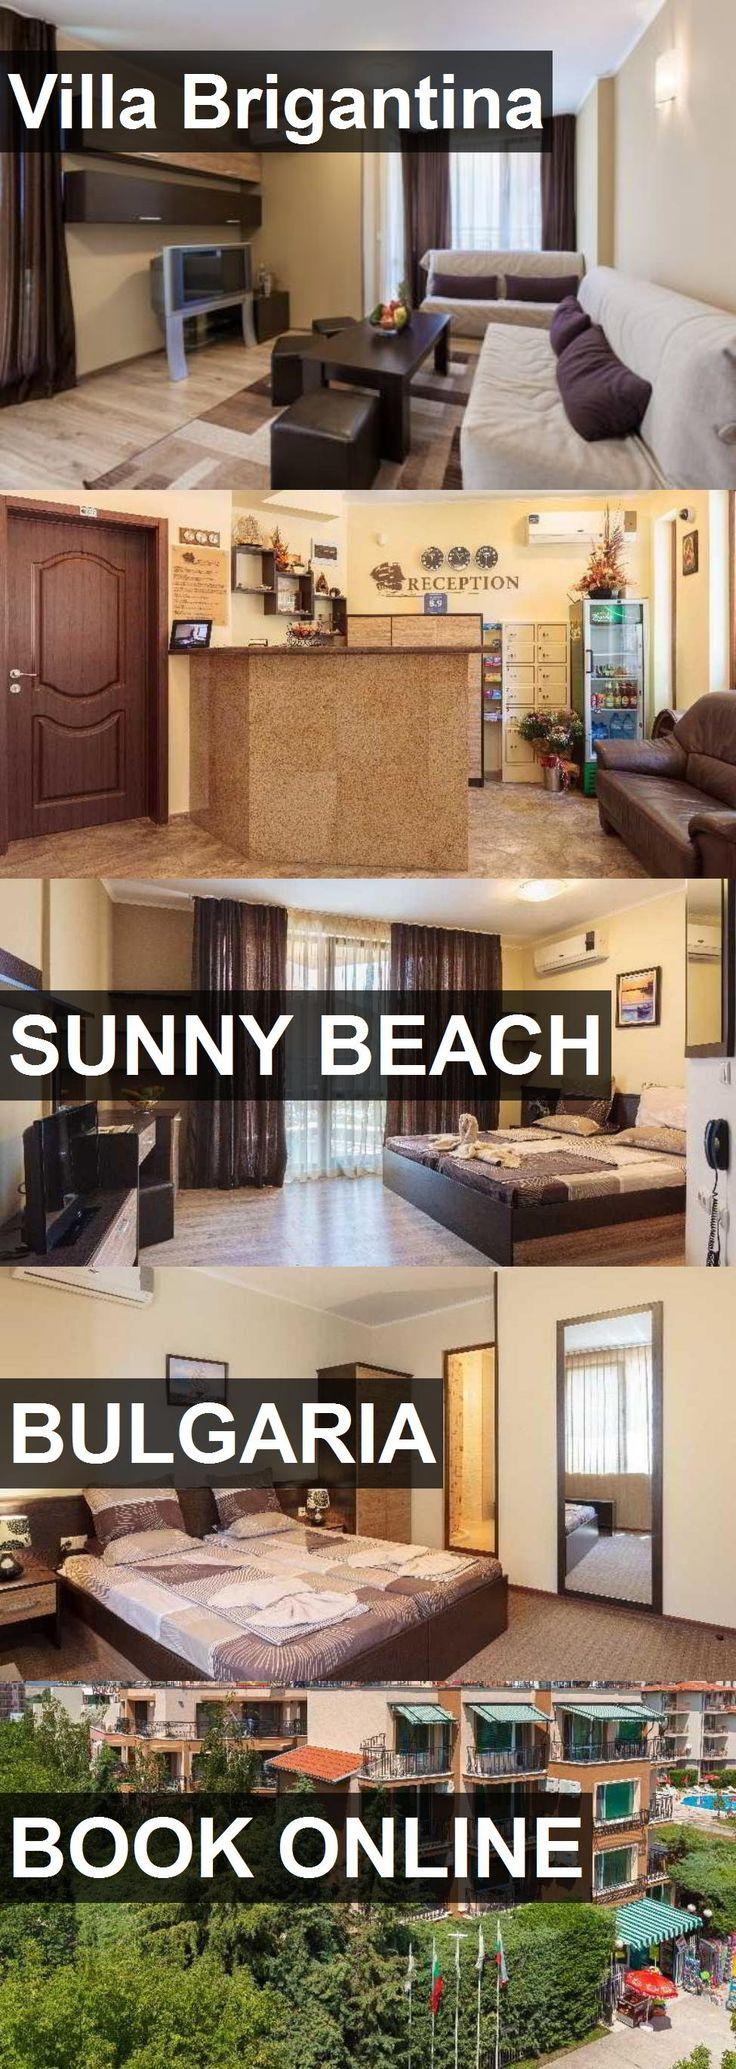 Hotel Villa Brigantina in Sunny Beach, Bulgaria. For more information, photos, reviews and best prices please follow the link. #Bulgaria #SunnyBeach #VillaBrigantina #hotel #travel #vacation